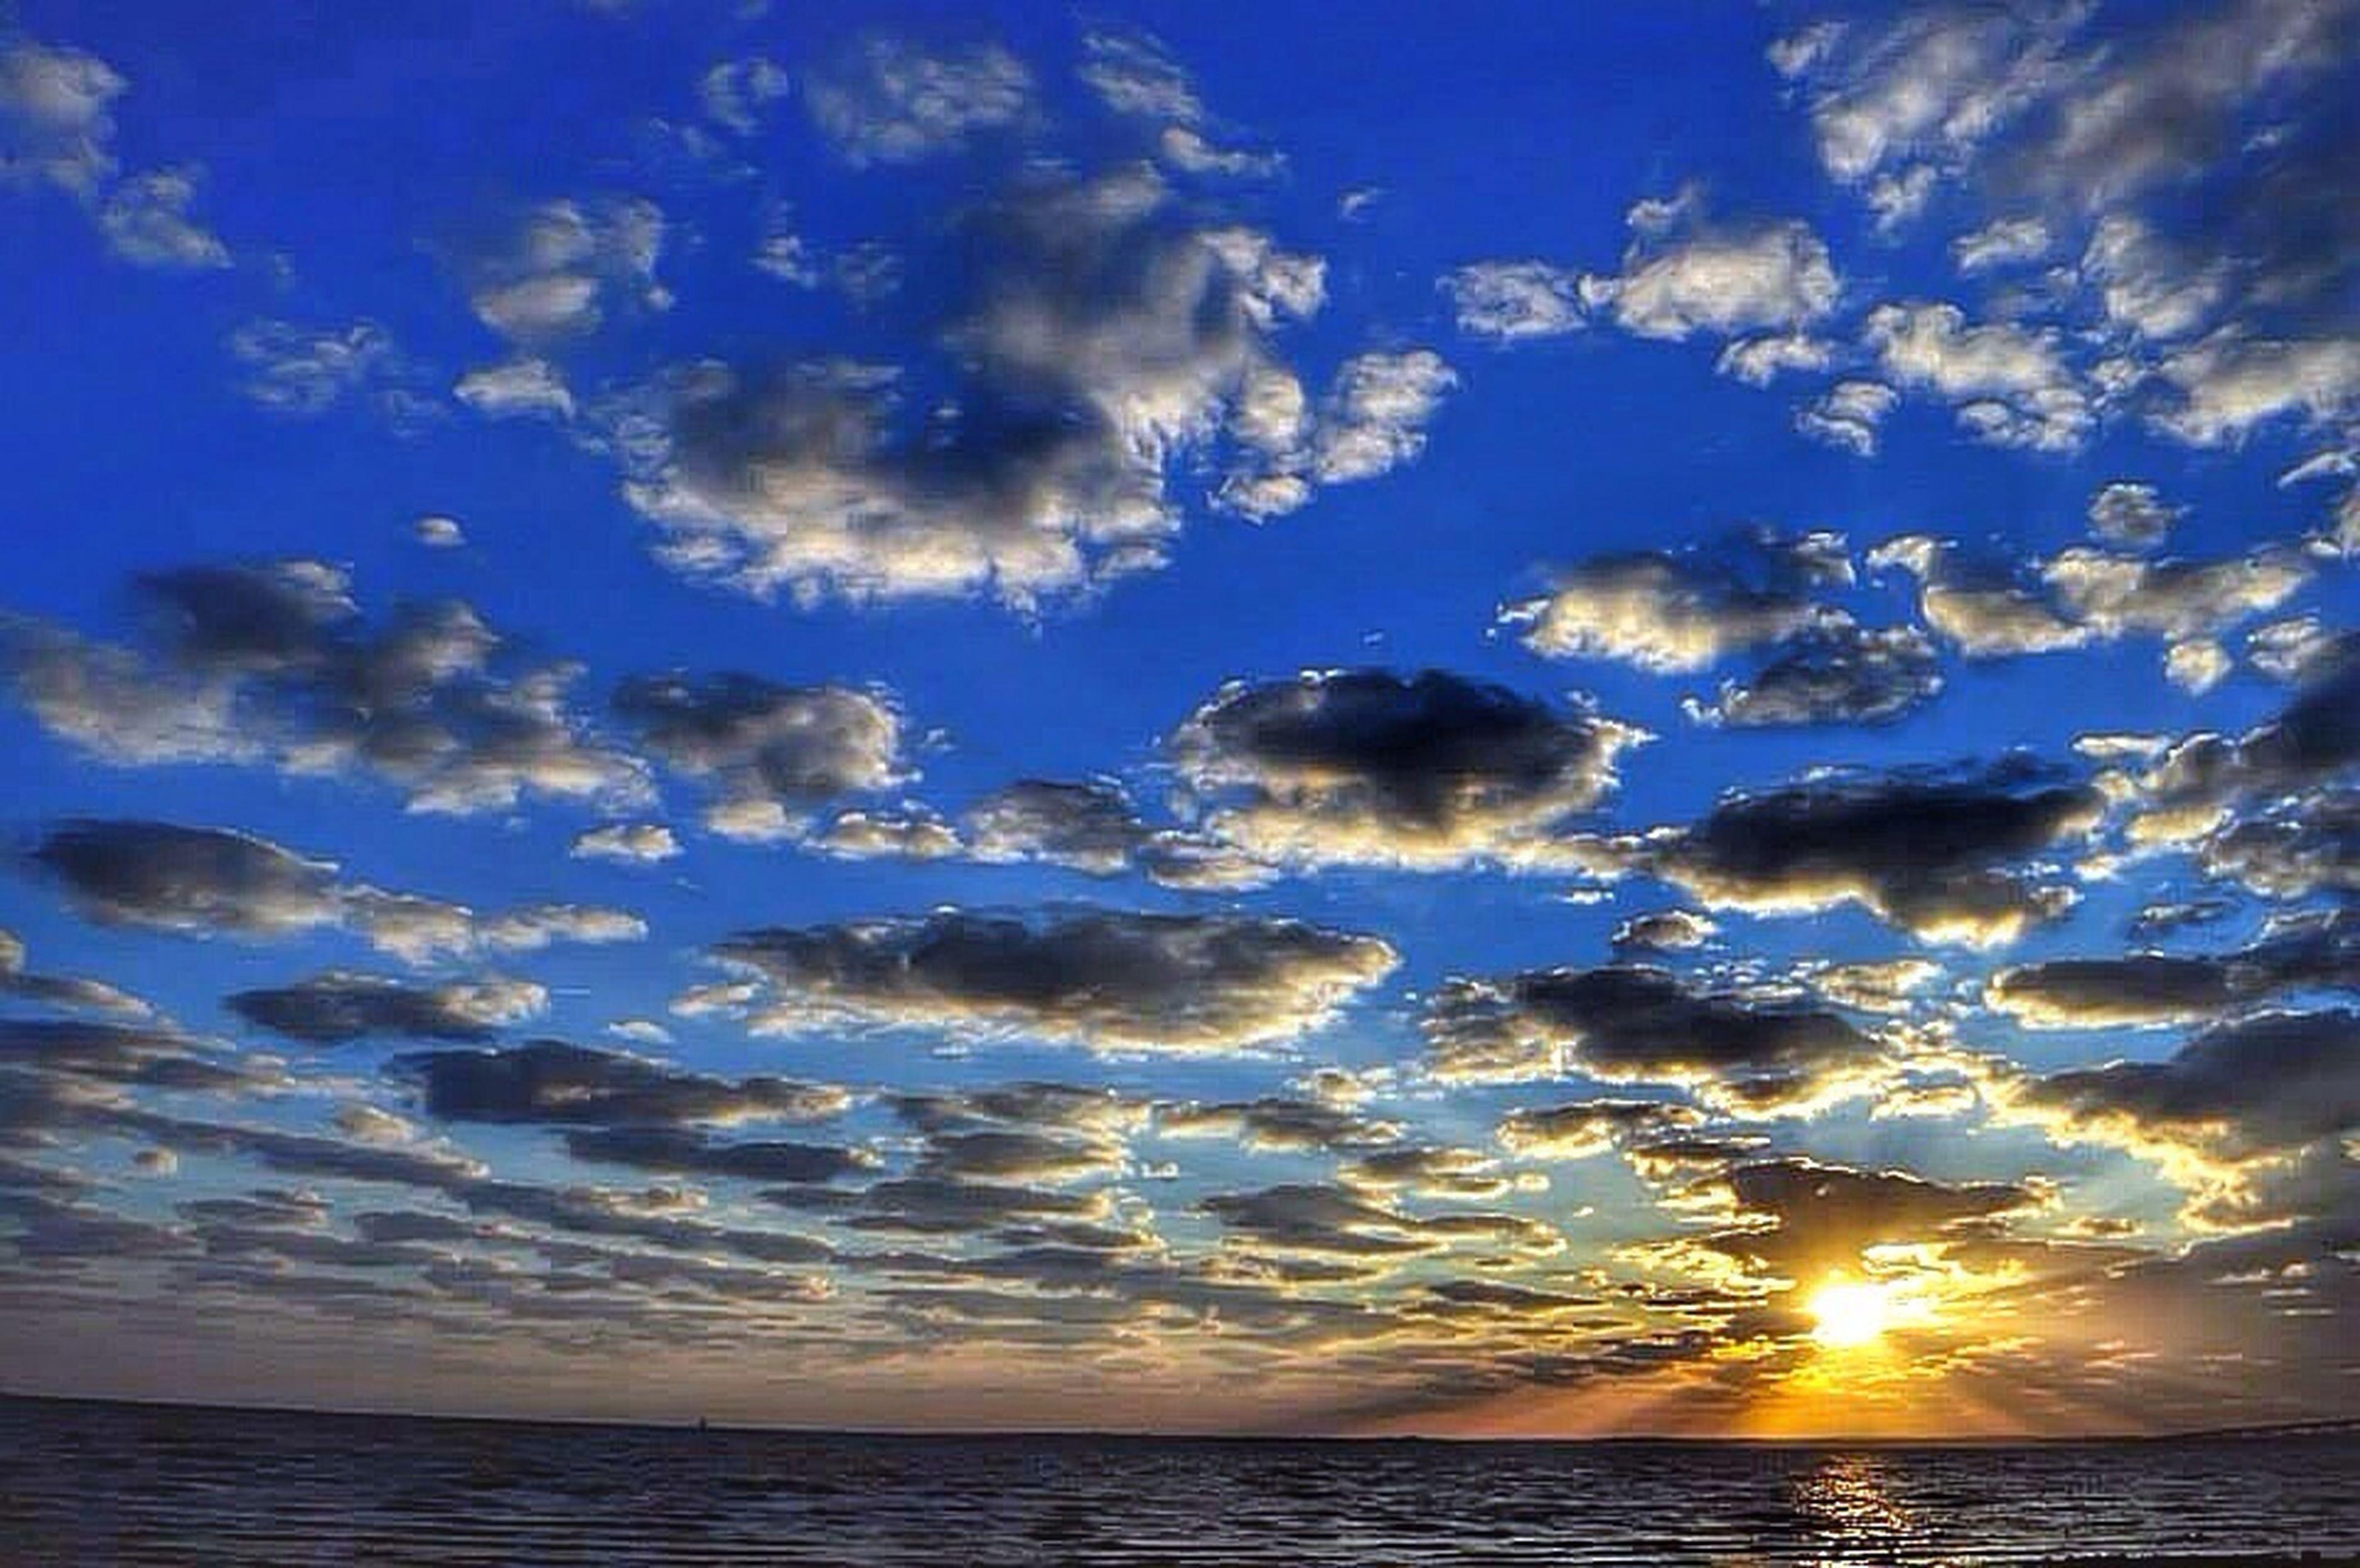 water, sky, sea, scenics, tranquil scene, sun, sunset, beauty in nature, horizon over water, tranquility, cloud - sky, nature, idyllic, reflection, cloud, sunlight, waterfront, sunbeam, beach, blue